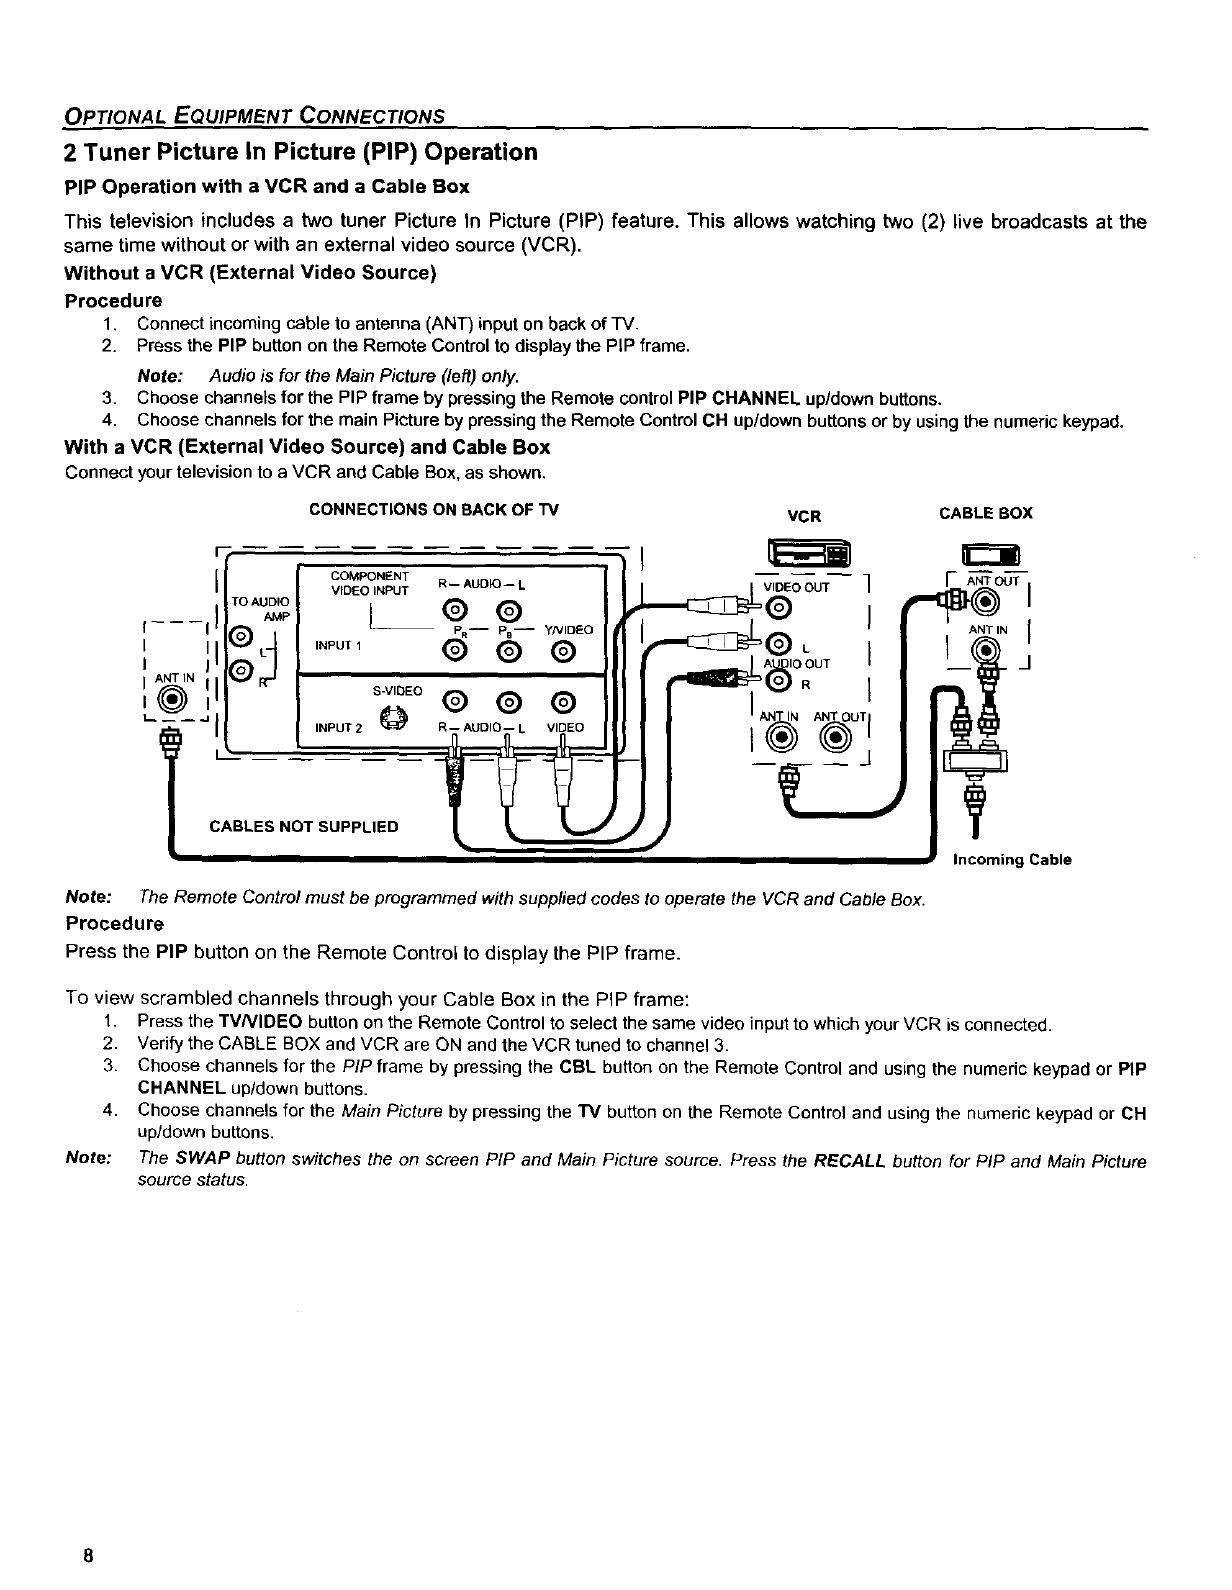 Pip And Vcr Wiring Diagram Schematics Tivo Diagrams Panasonic Direct View Digital 27 To 40 Tv Manual L0302145 Repair